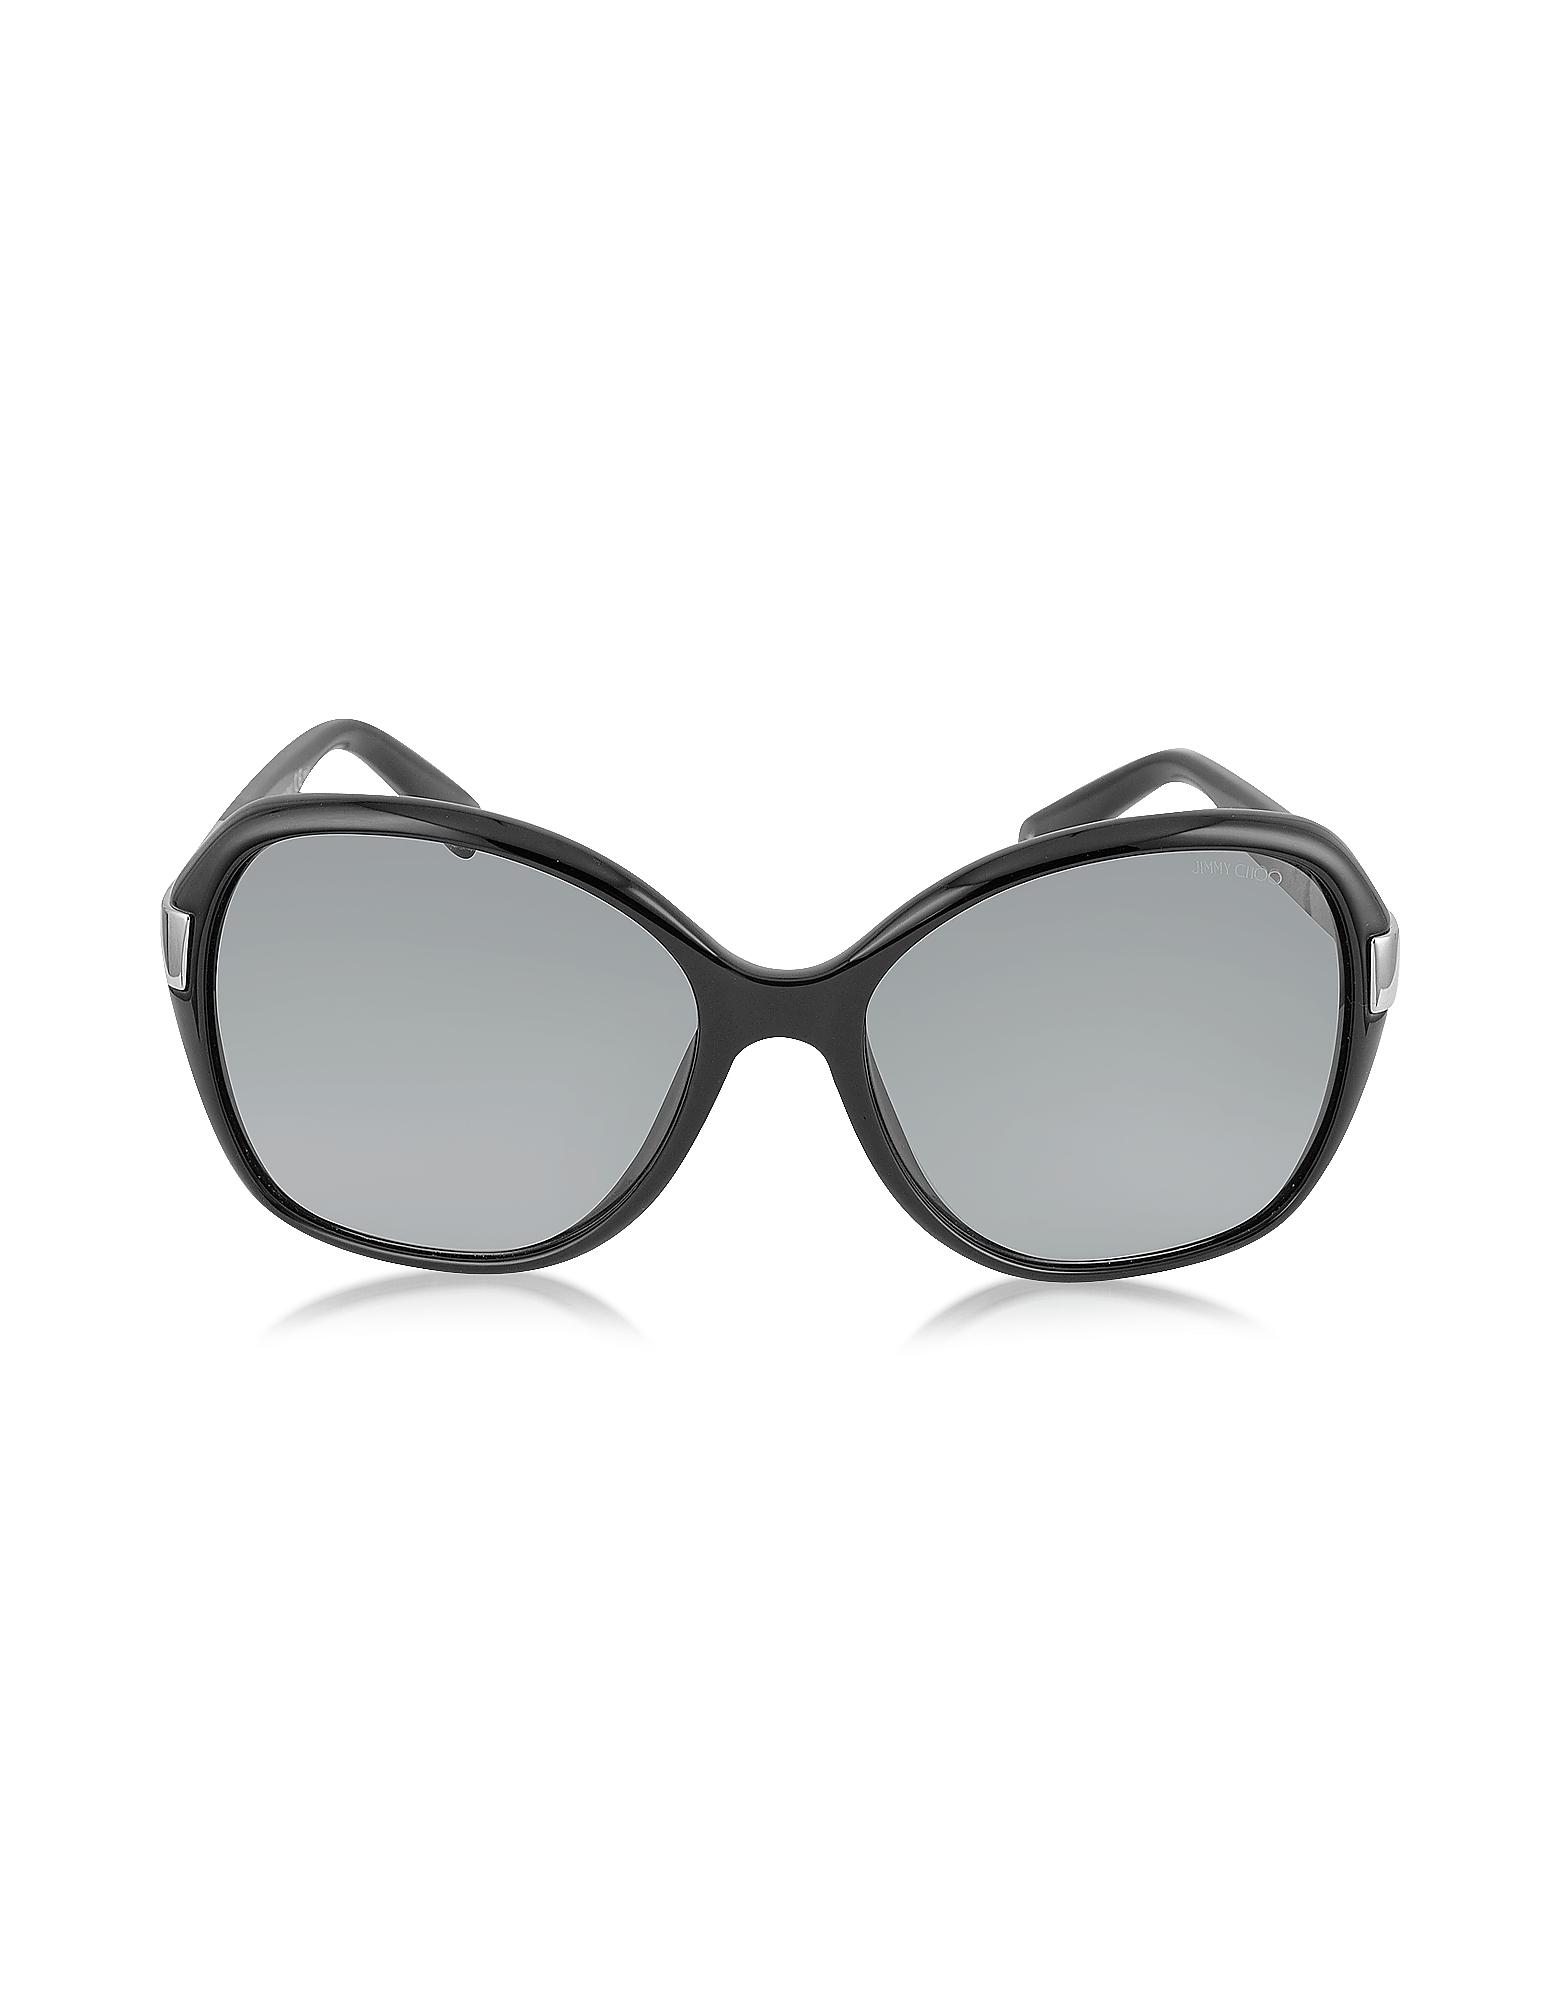 a6c63fb770 Jimmy Choo Alana s Round Framed Sunglasses W crystal Inserts in ...